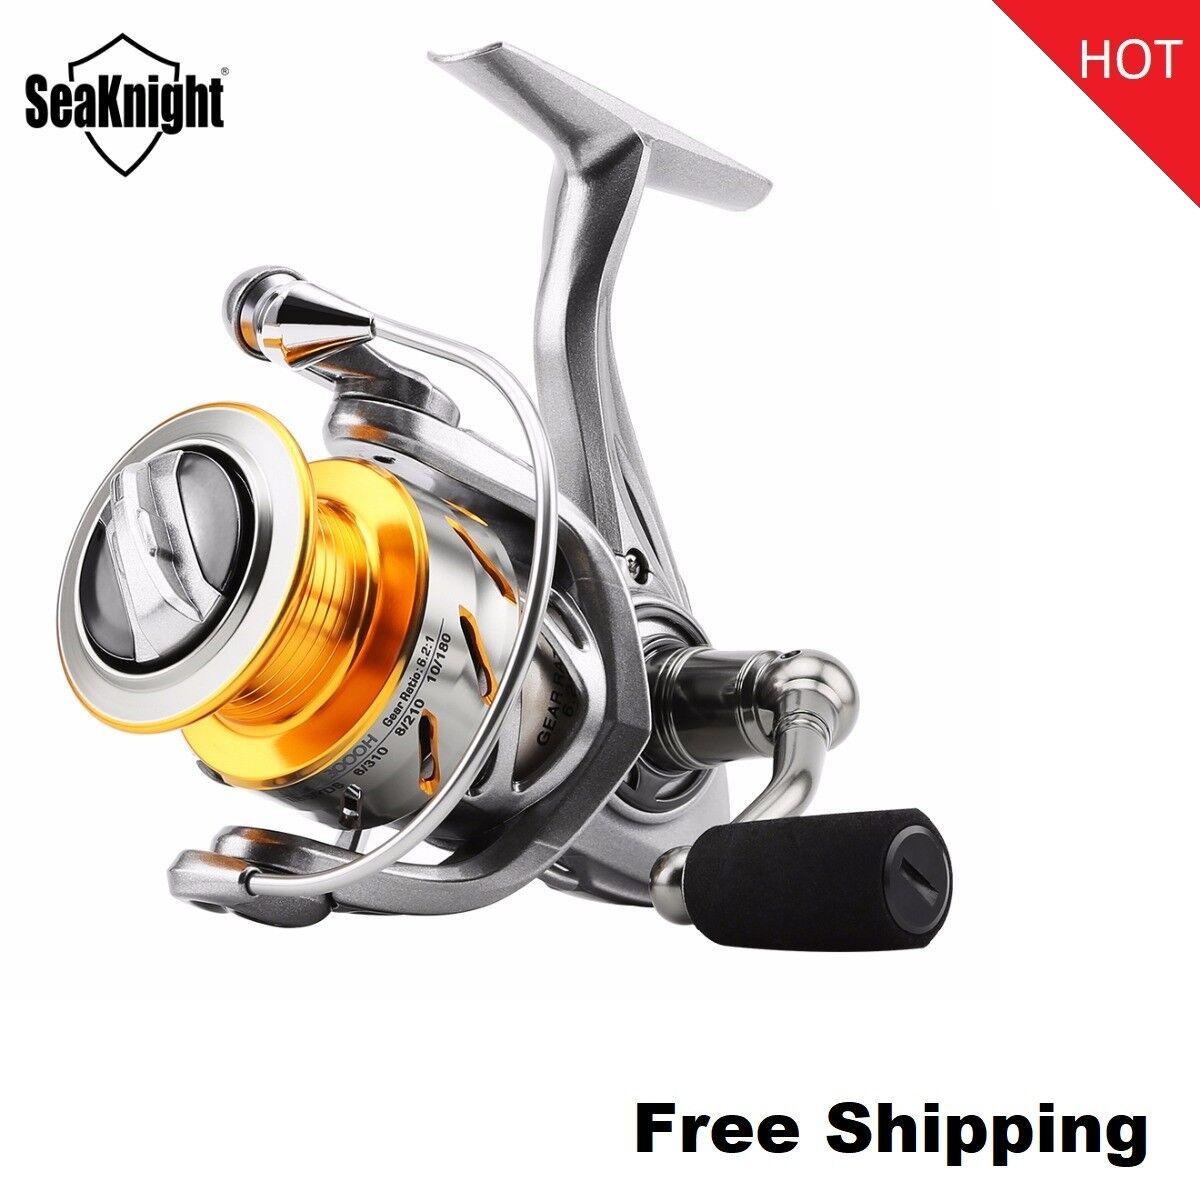 SeaKnight  Fishing Reel RAPID 6.2 1 4.7 1 11BB 3000H 4000H 5000 6000 Spinning